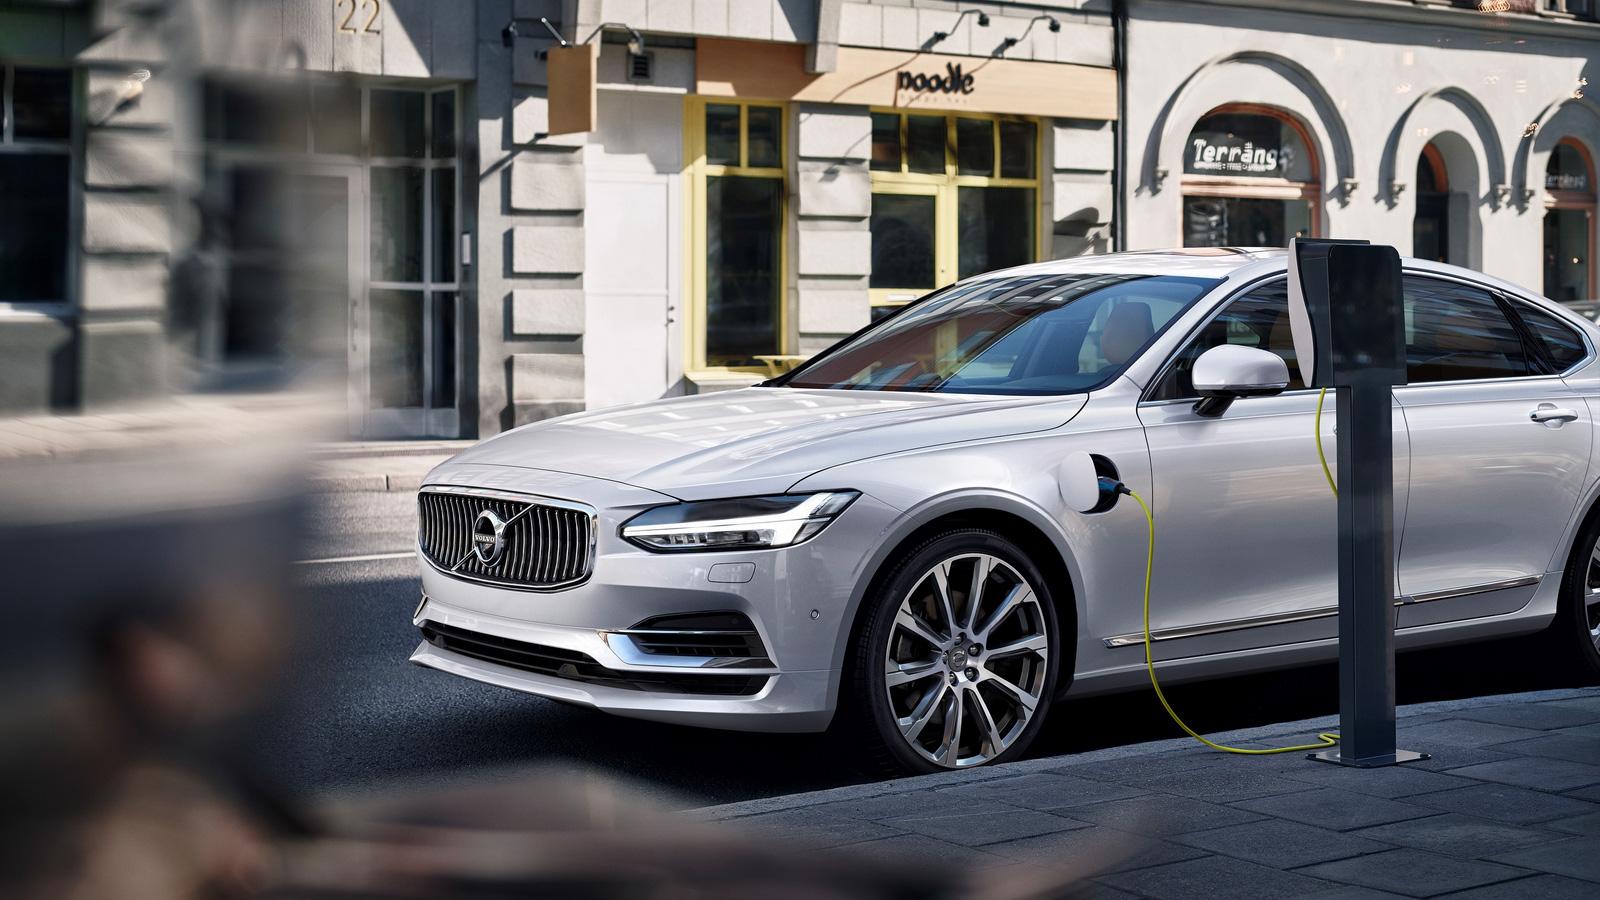 Volvo PHEV 車主滿意度高達 96.8!寧靜、雙動力效能成車主欣賞特質